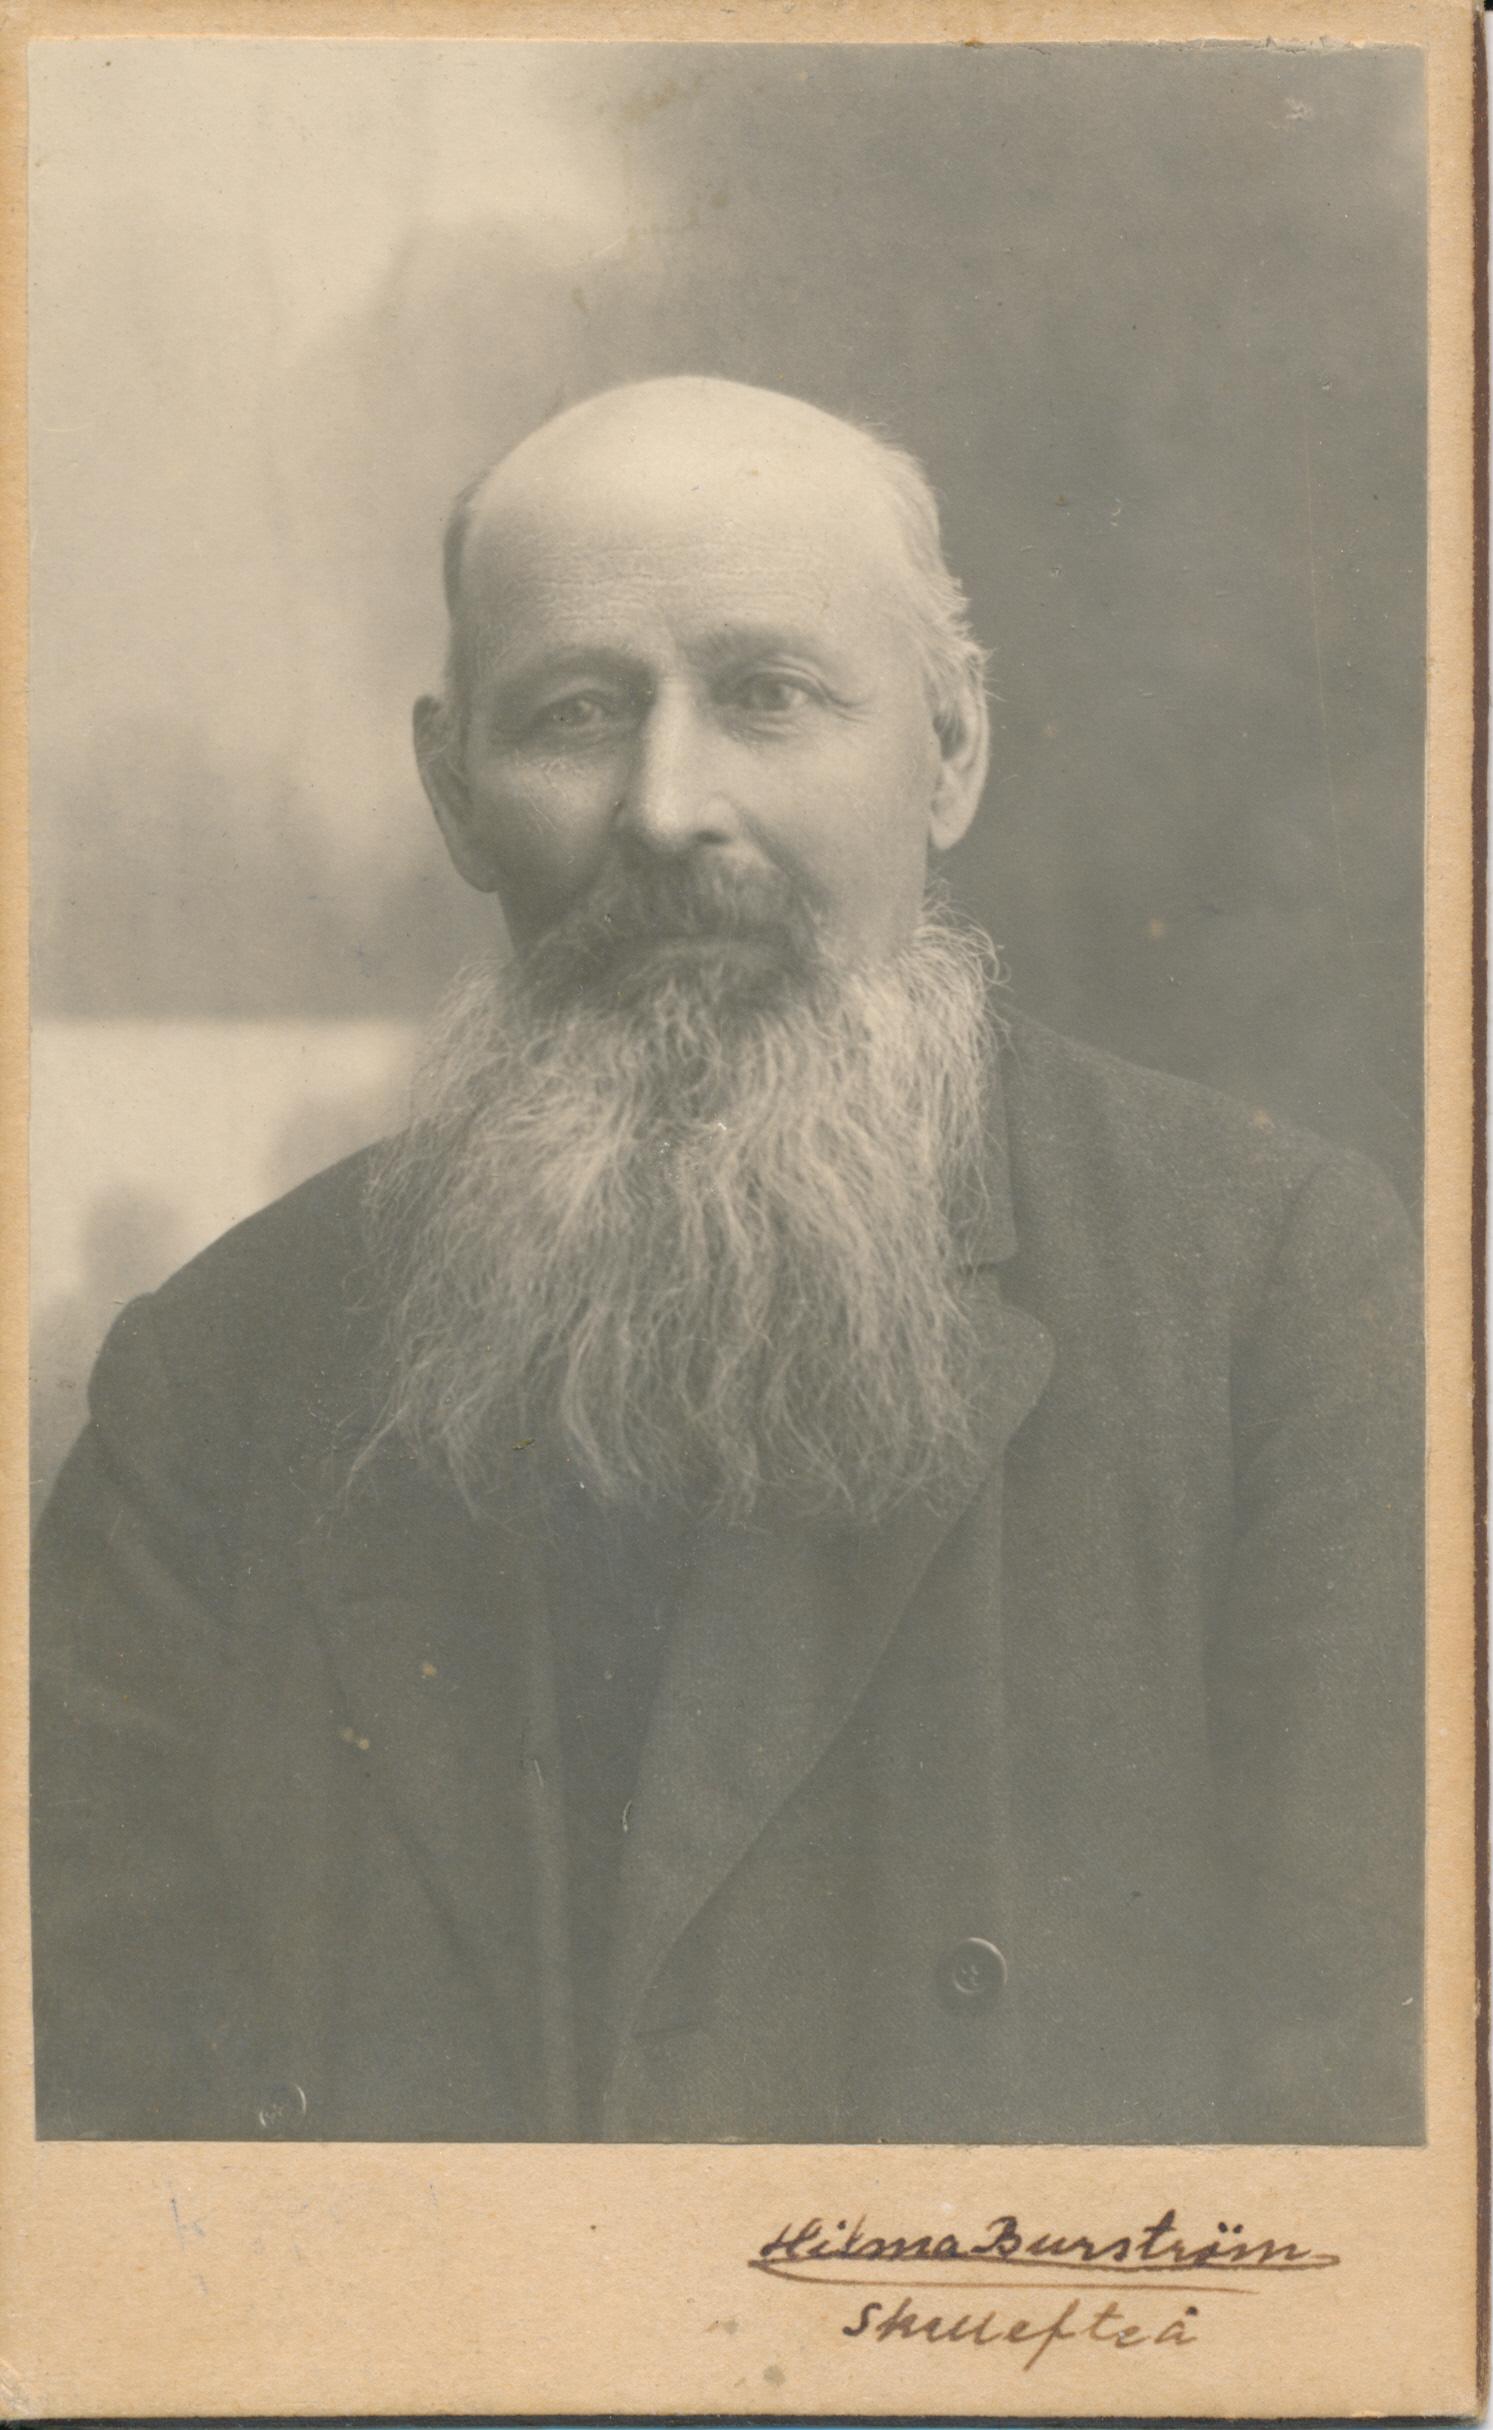 Korpral Gabriel Anton Lilja